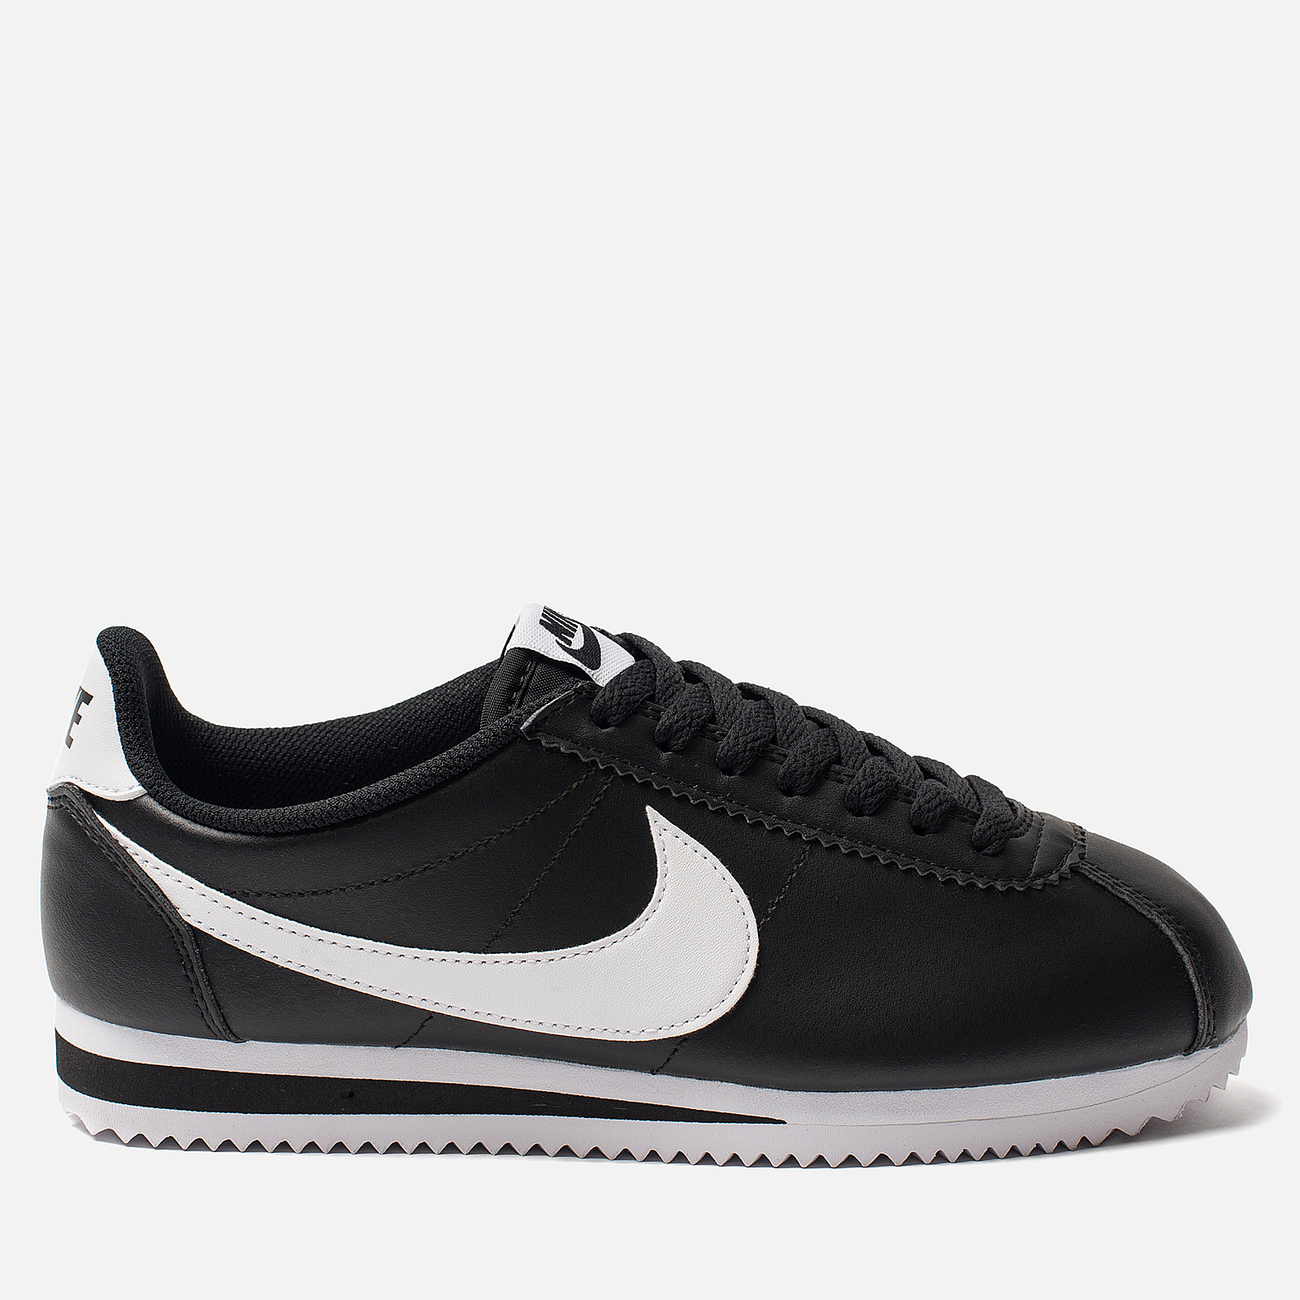 Женские кроссовки Nike Classic Cortez Leather Black/White